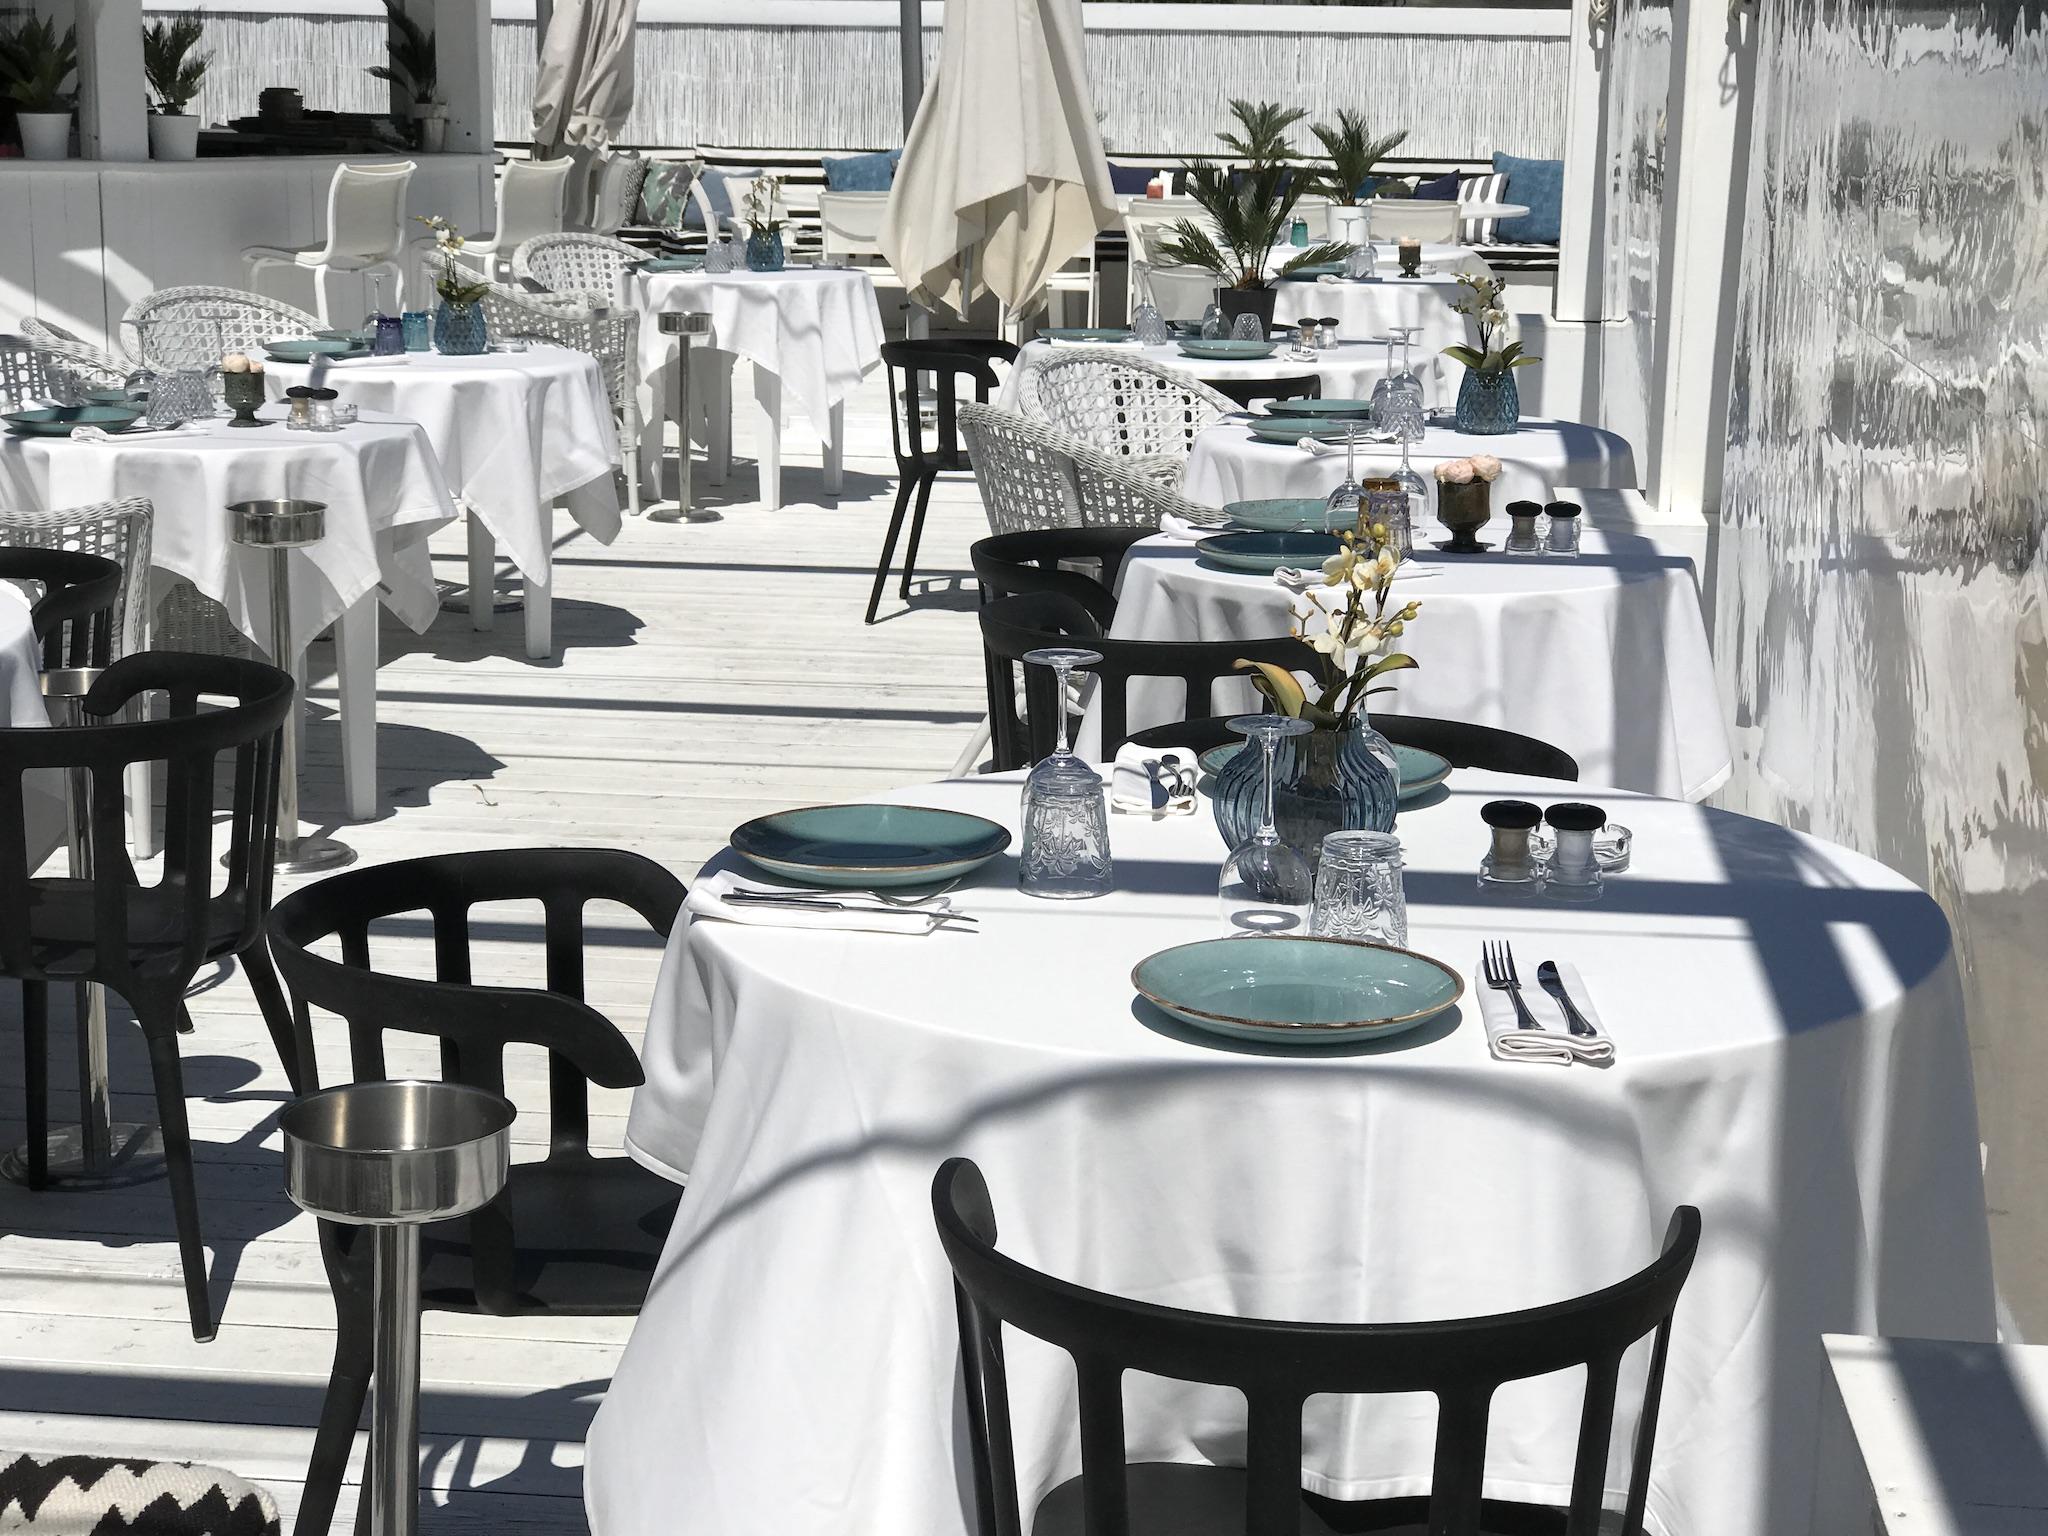 Maison Bianca Plage, Maison Bianca Beach St. Tropez, stylish Beach club St. Tropez, schöner Strand Club St. Tropez, Lifestyle-Blog, Lieblingstil.com